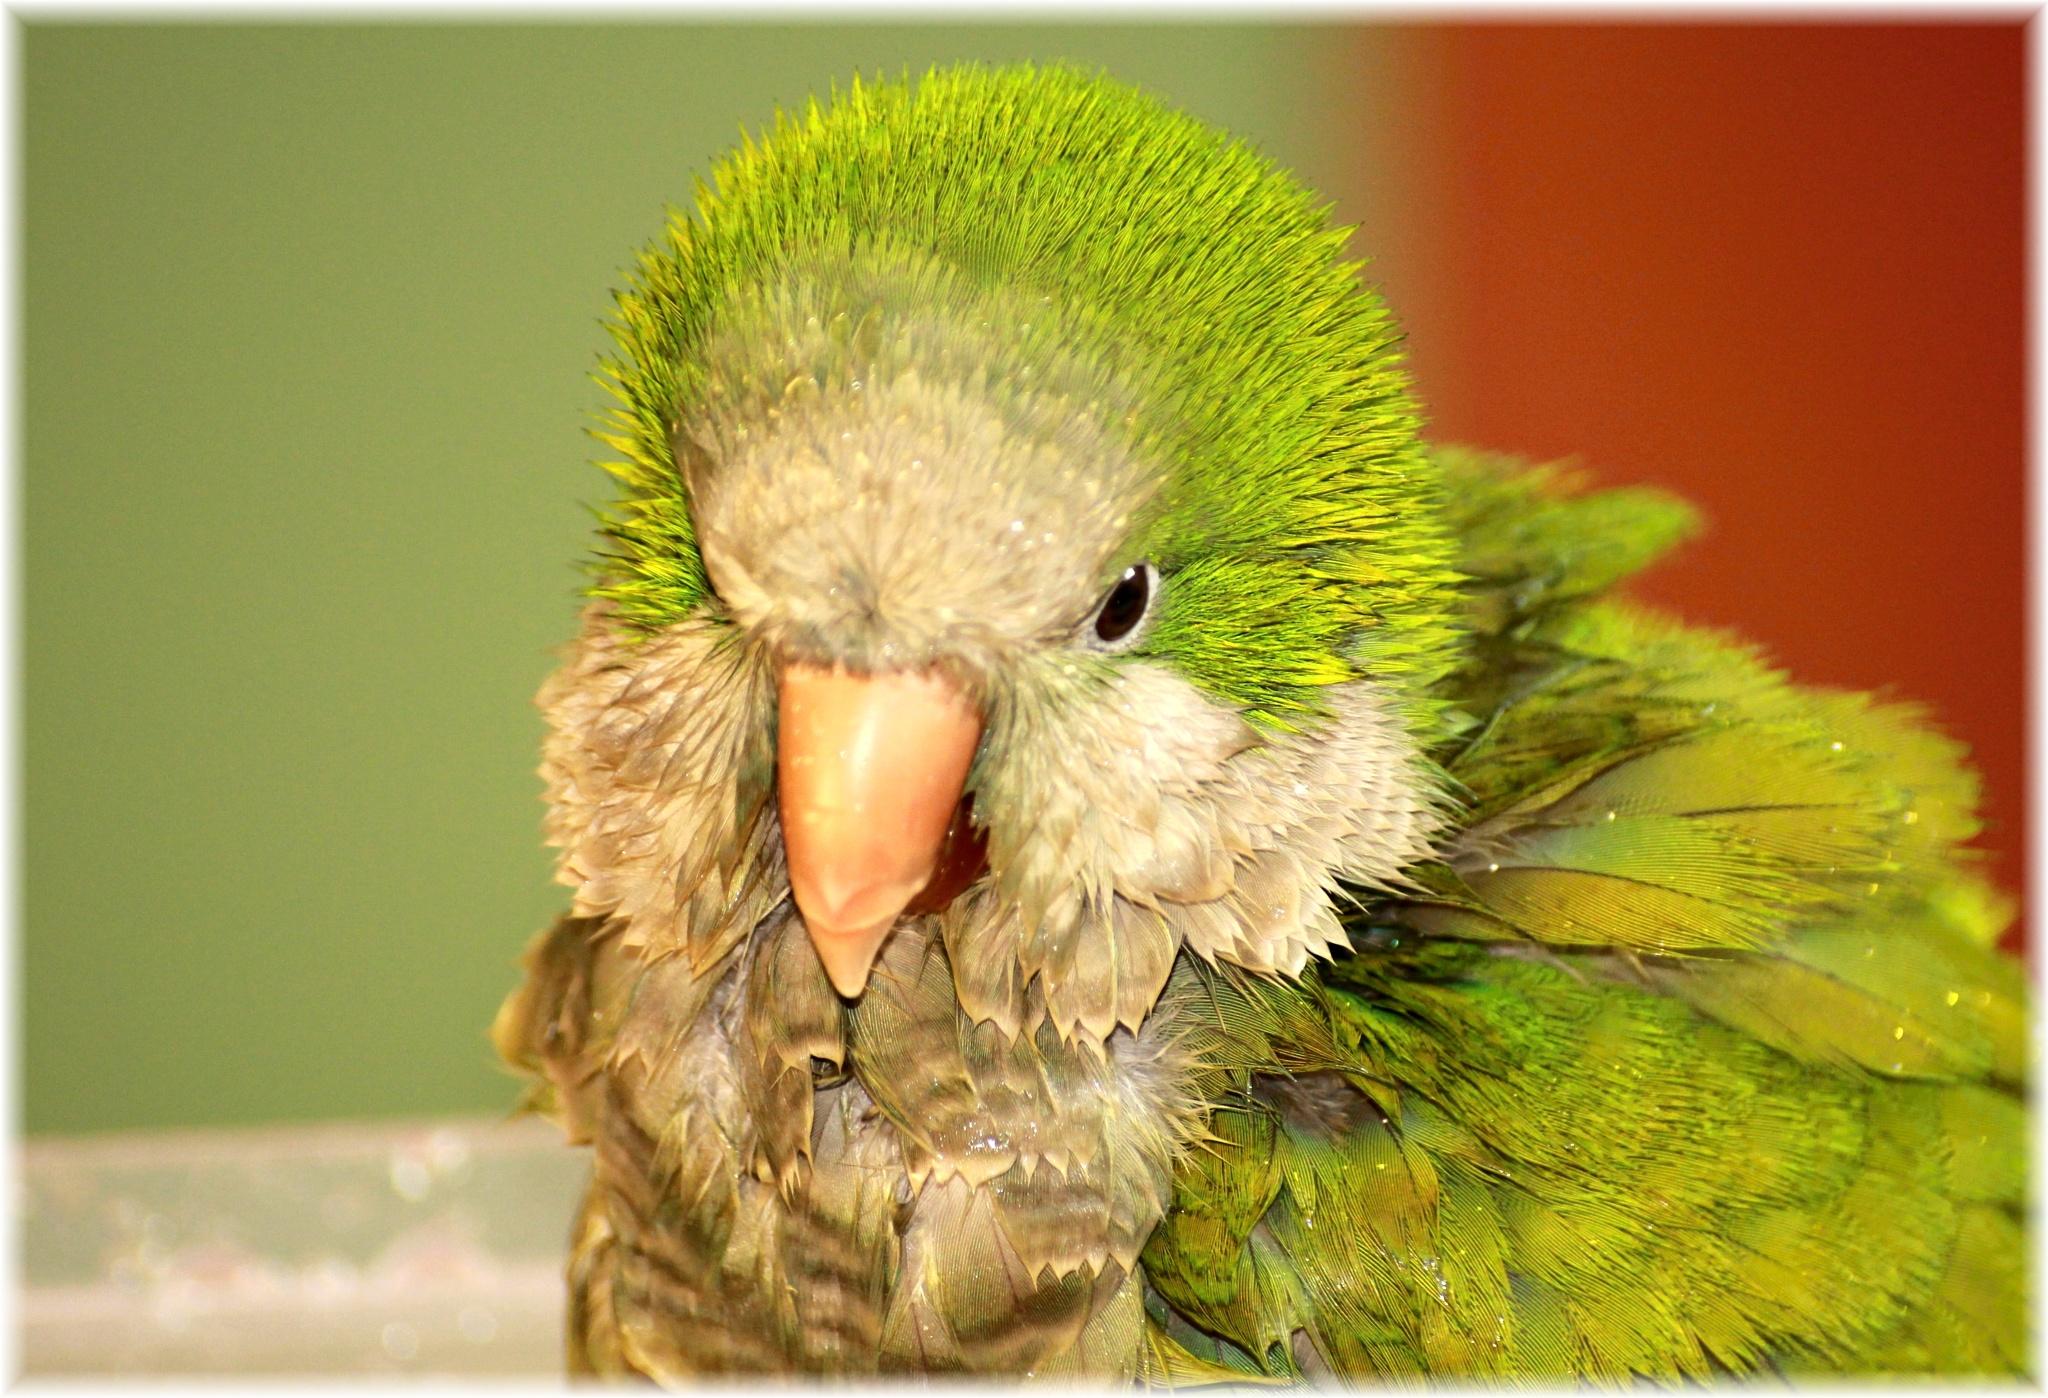 Papoušek by nejfoto